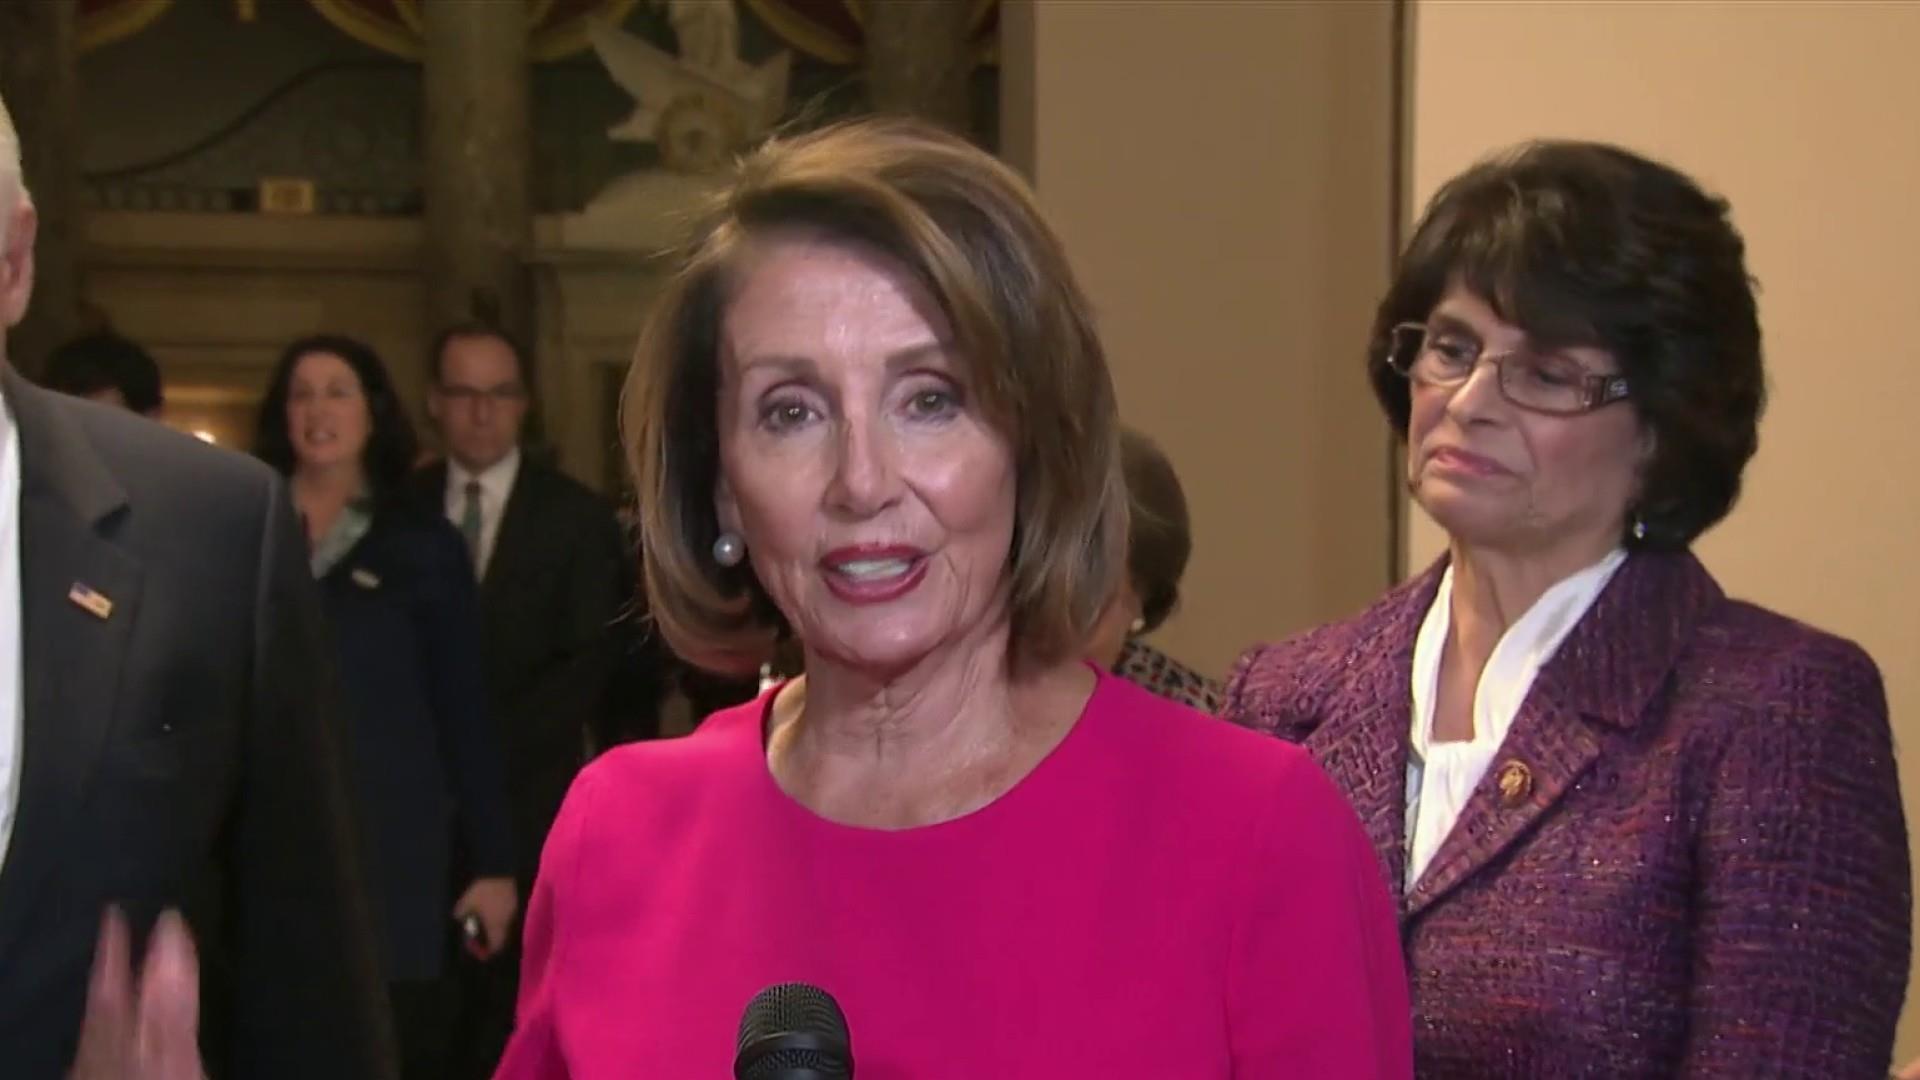 Pelosi heads to White House as shutdown continues